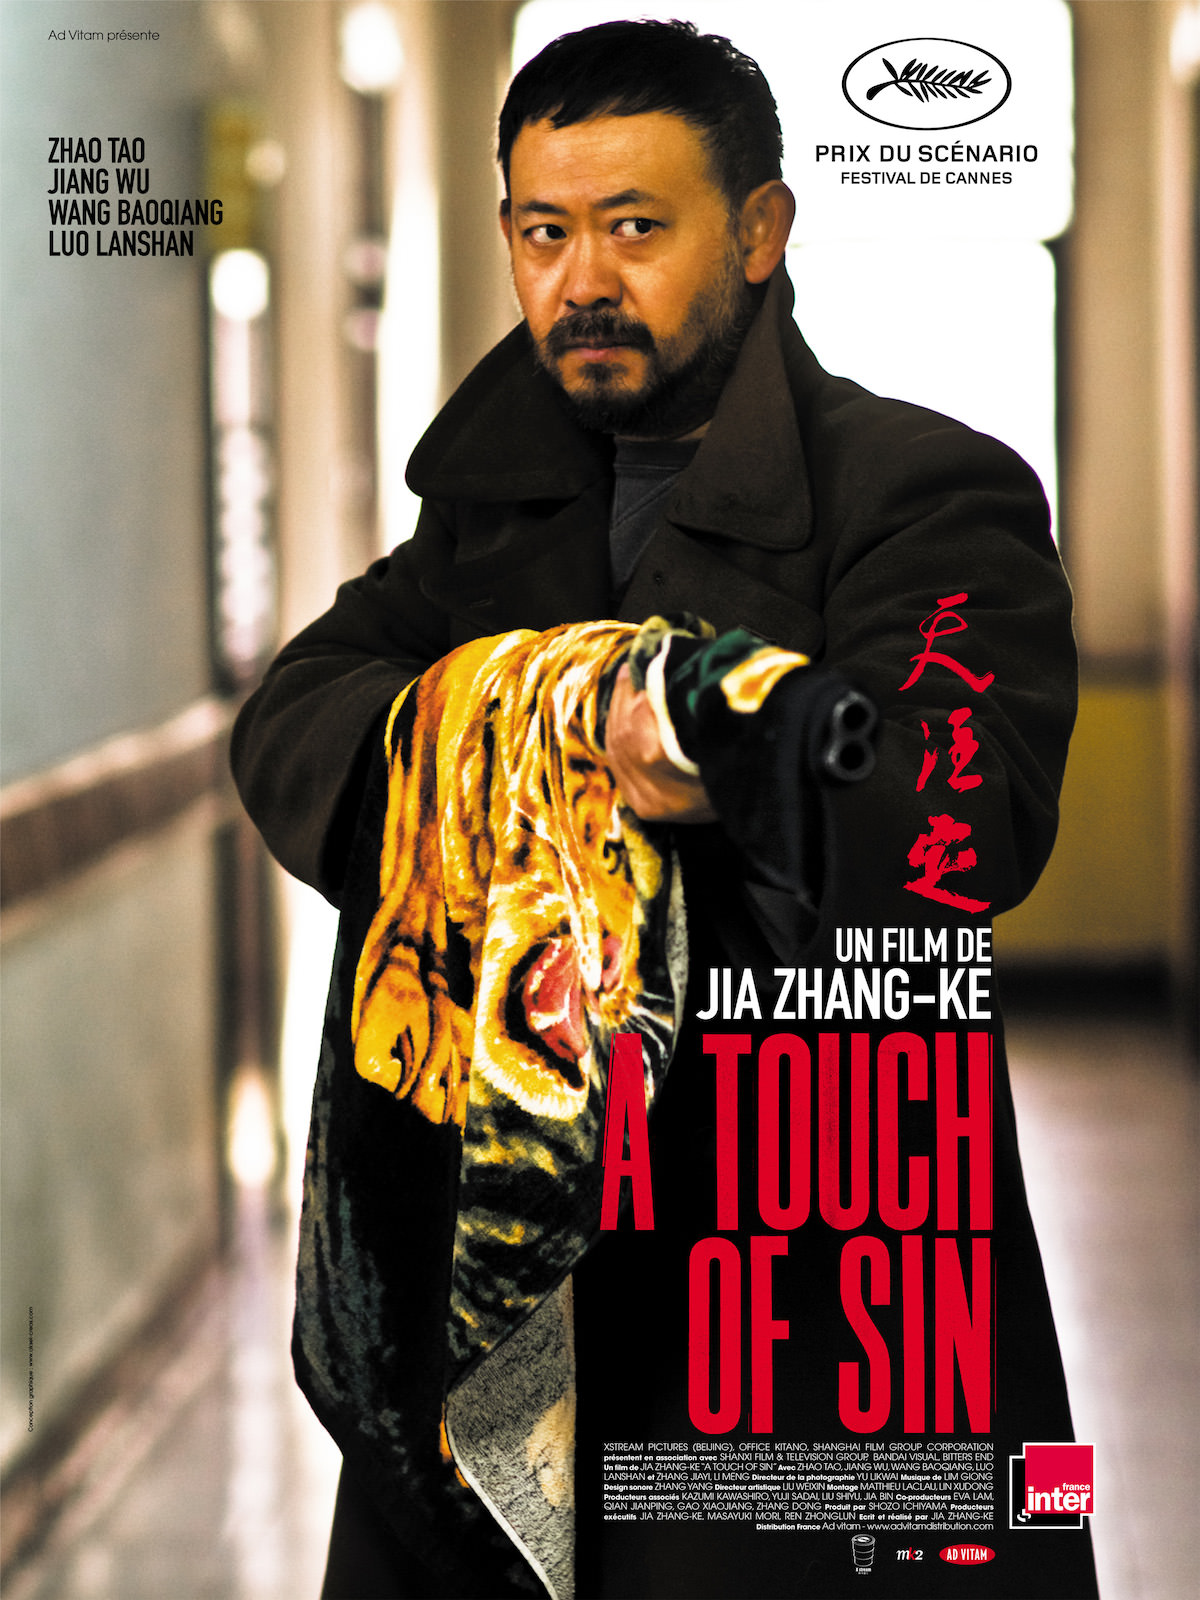 A touch of sin zhang ke